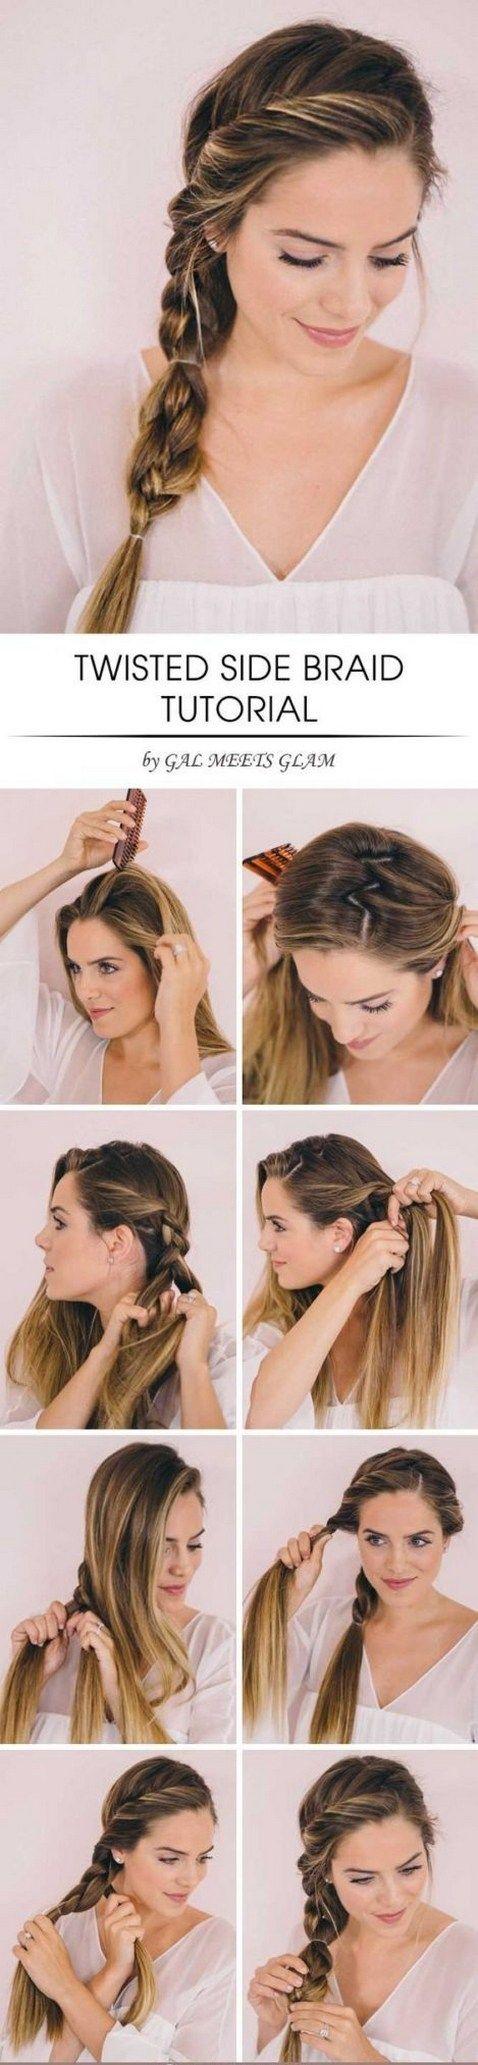 100 Hairstyles For Medium Hair favorite hairstyle